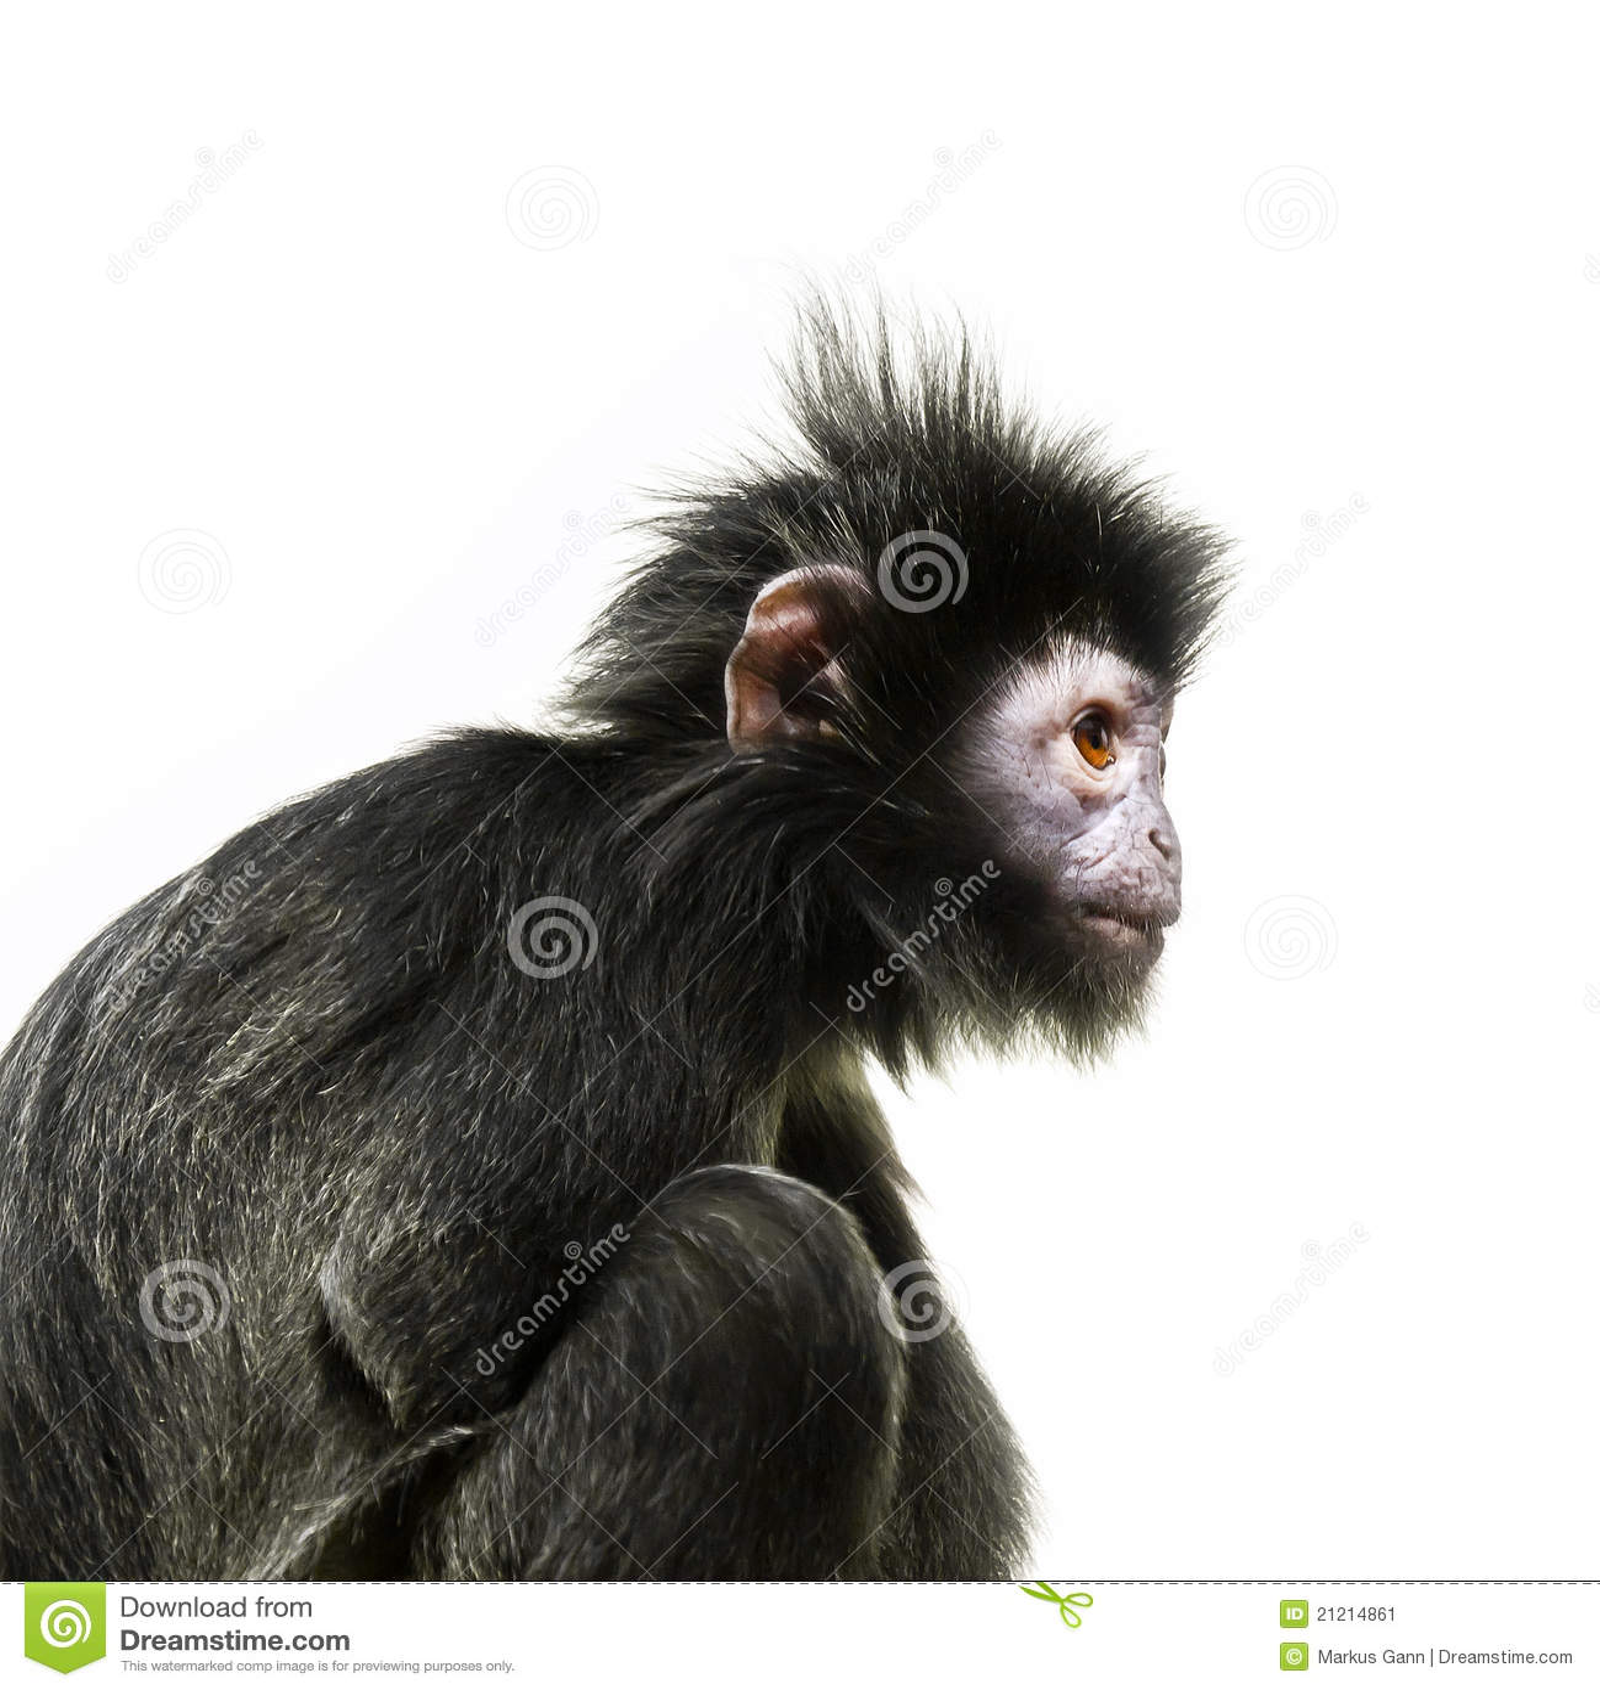 Black ape with orange eye